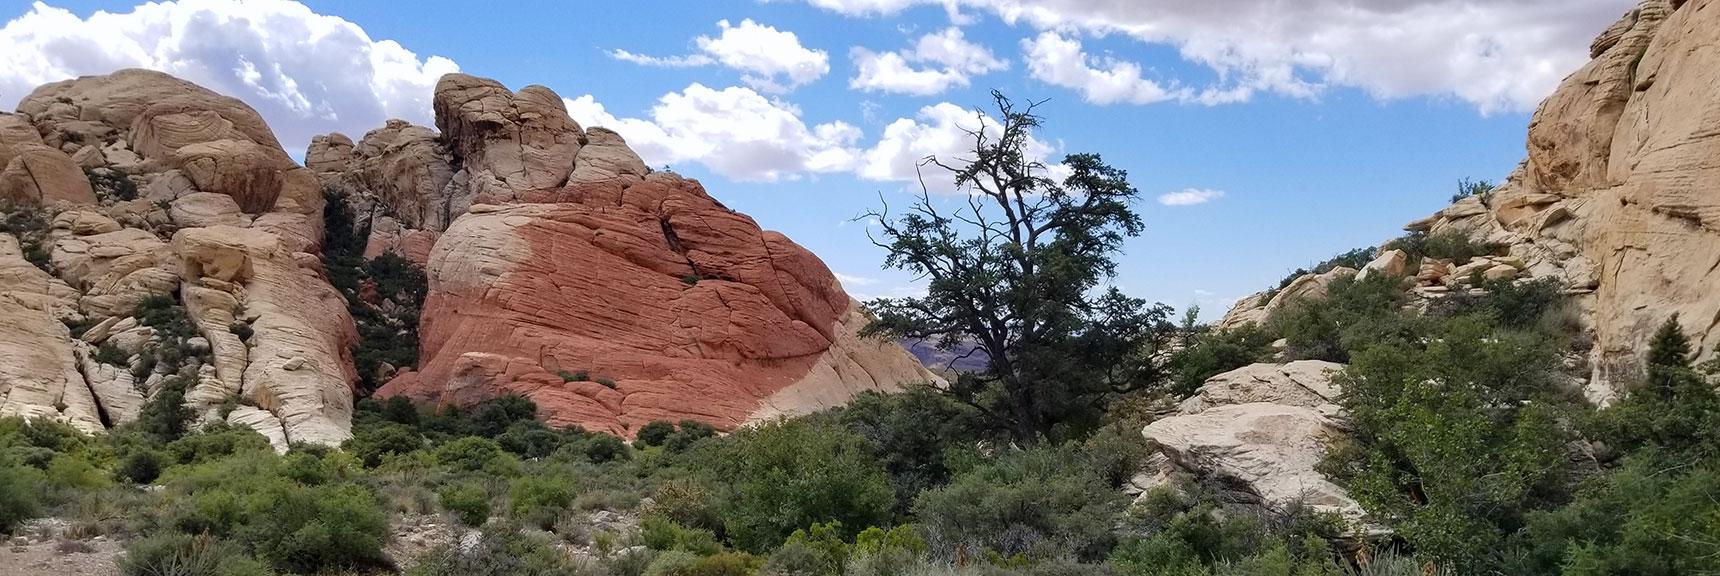 Returning to the Turtlehead Peak Trailhead in Red Rock National Park, Nevada